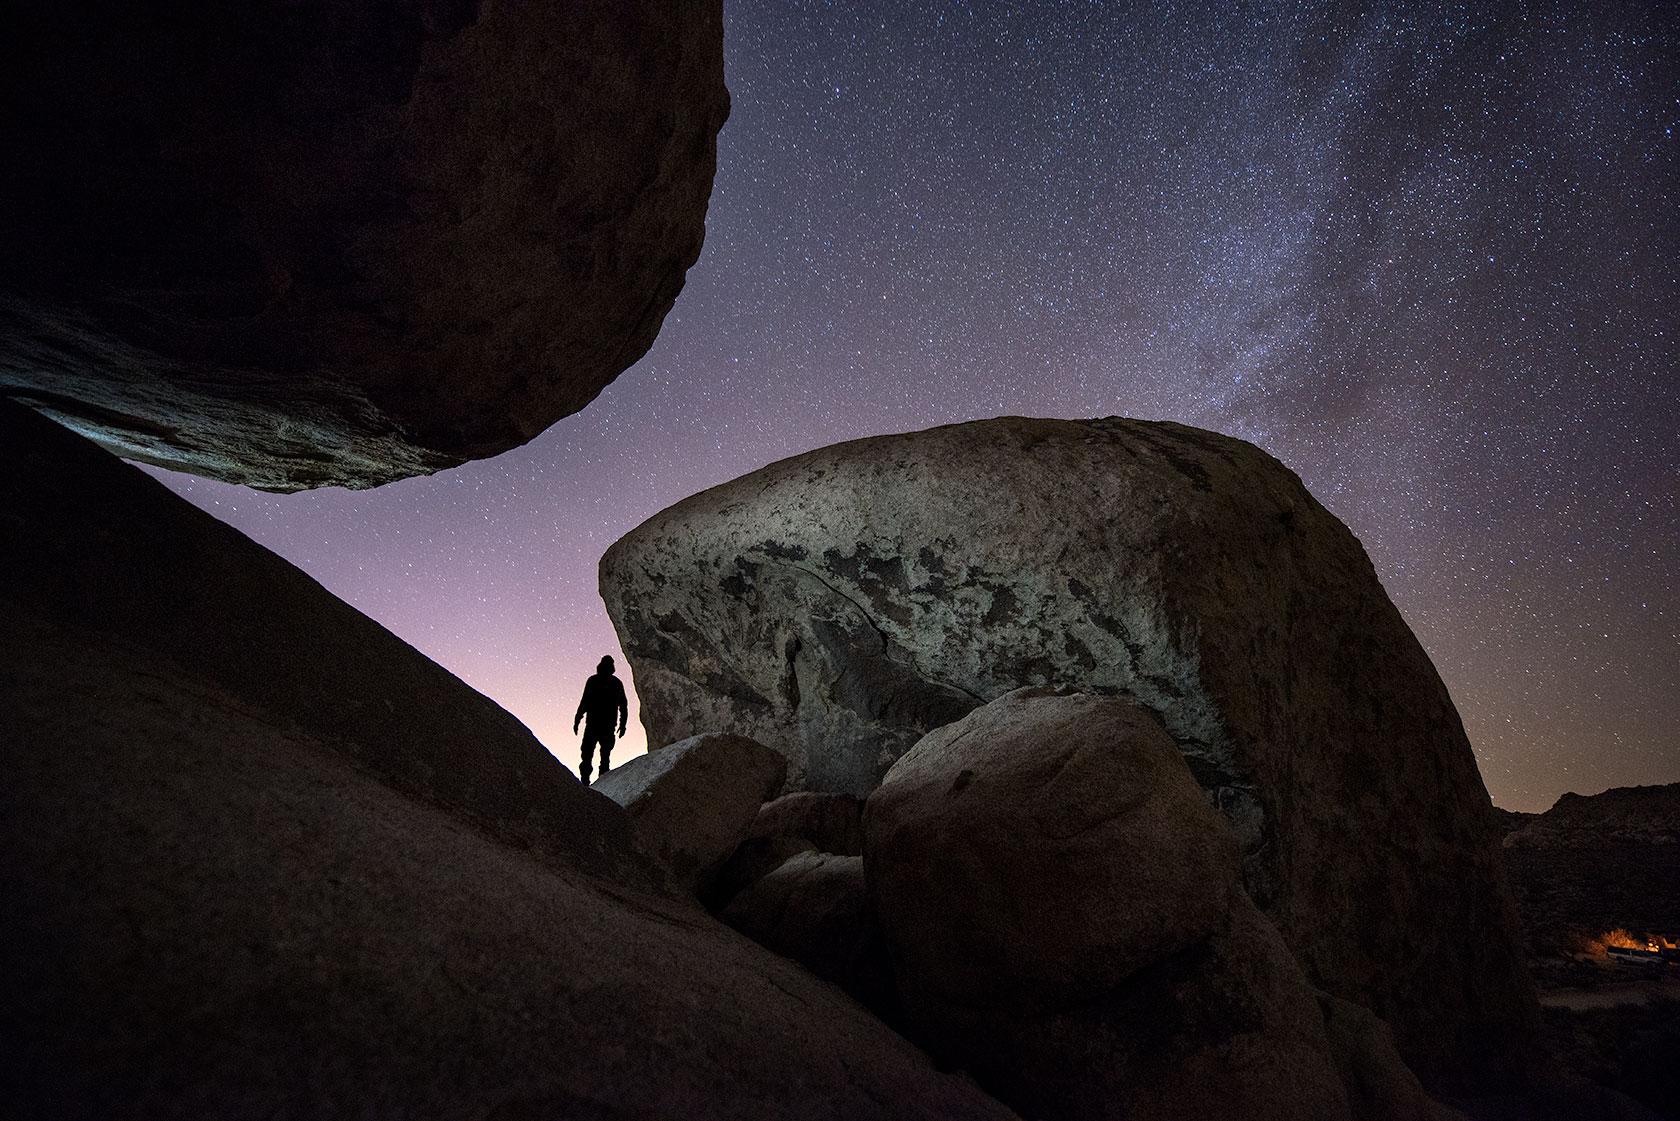 austin-trigg-joshua-tree-national-park-hiker-explores-milky-way-night-sky-stars-rocks.jpg